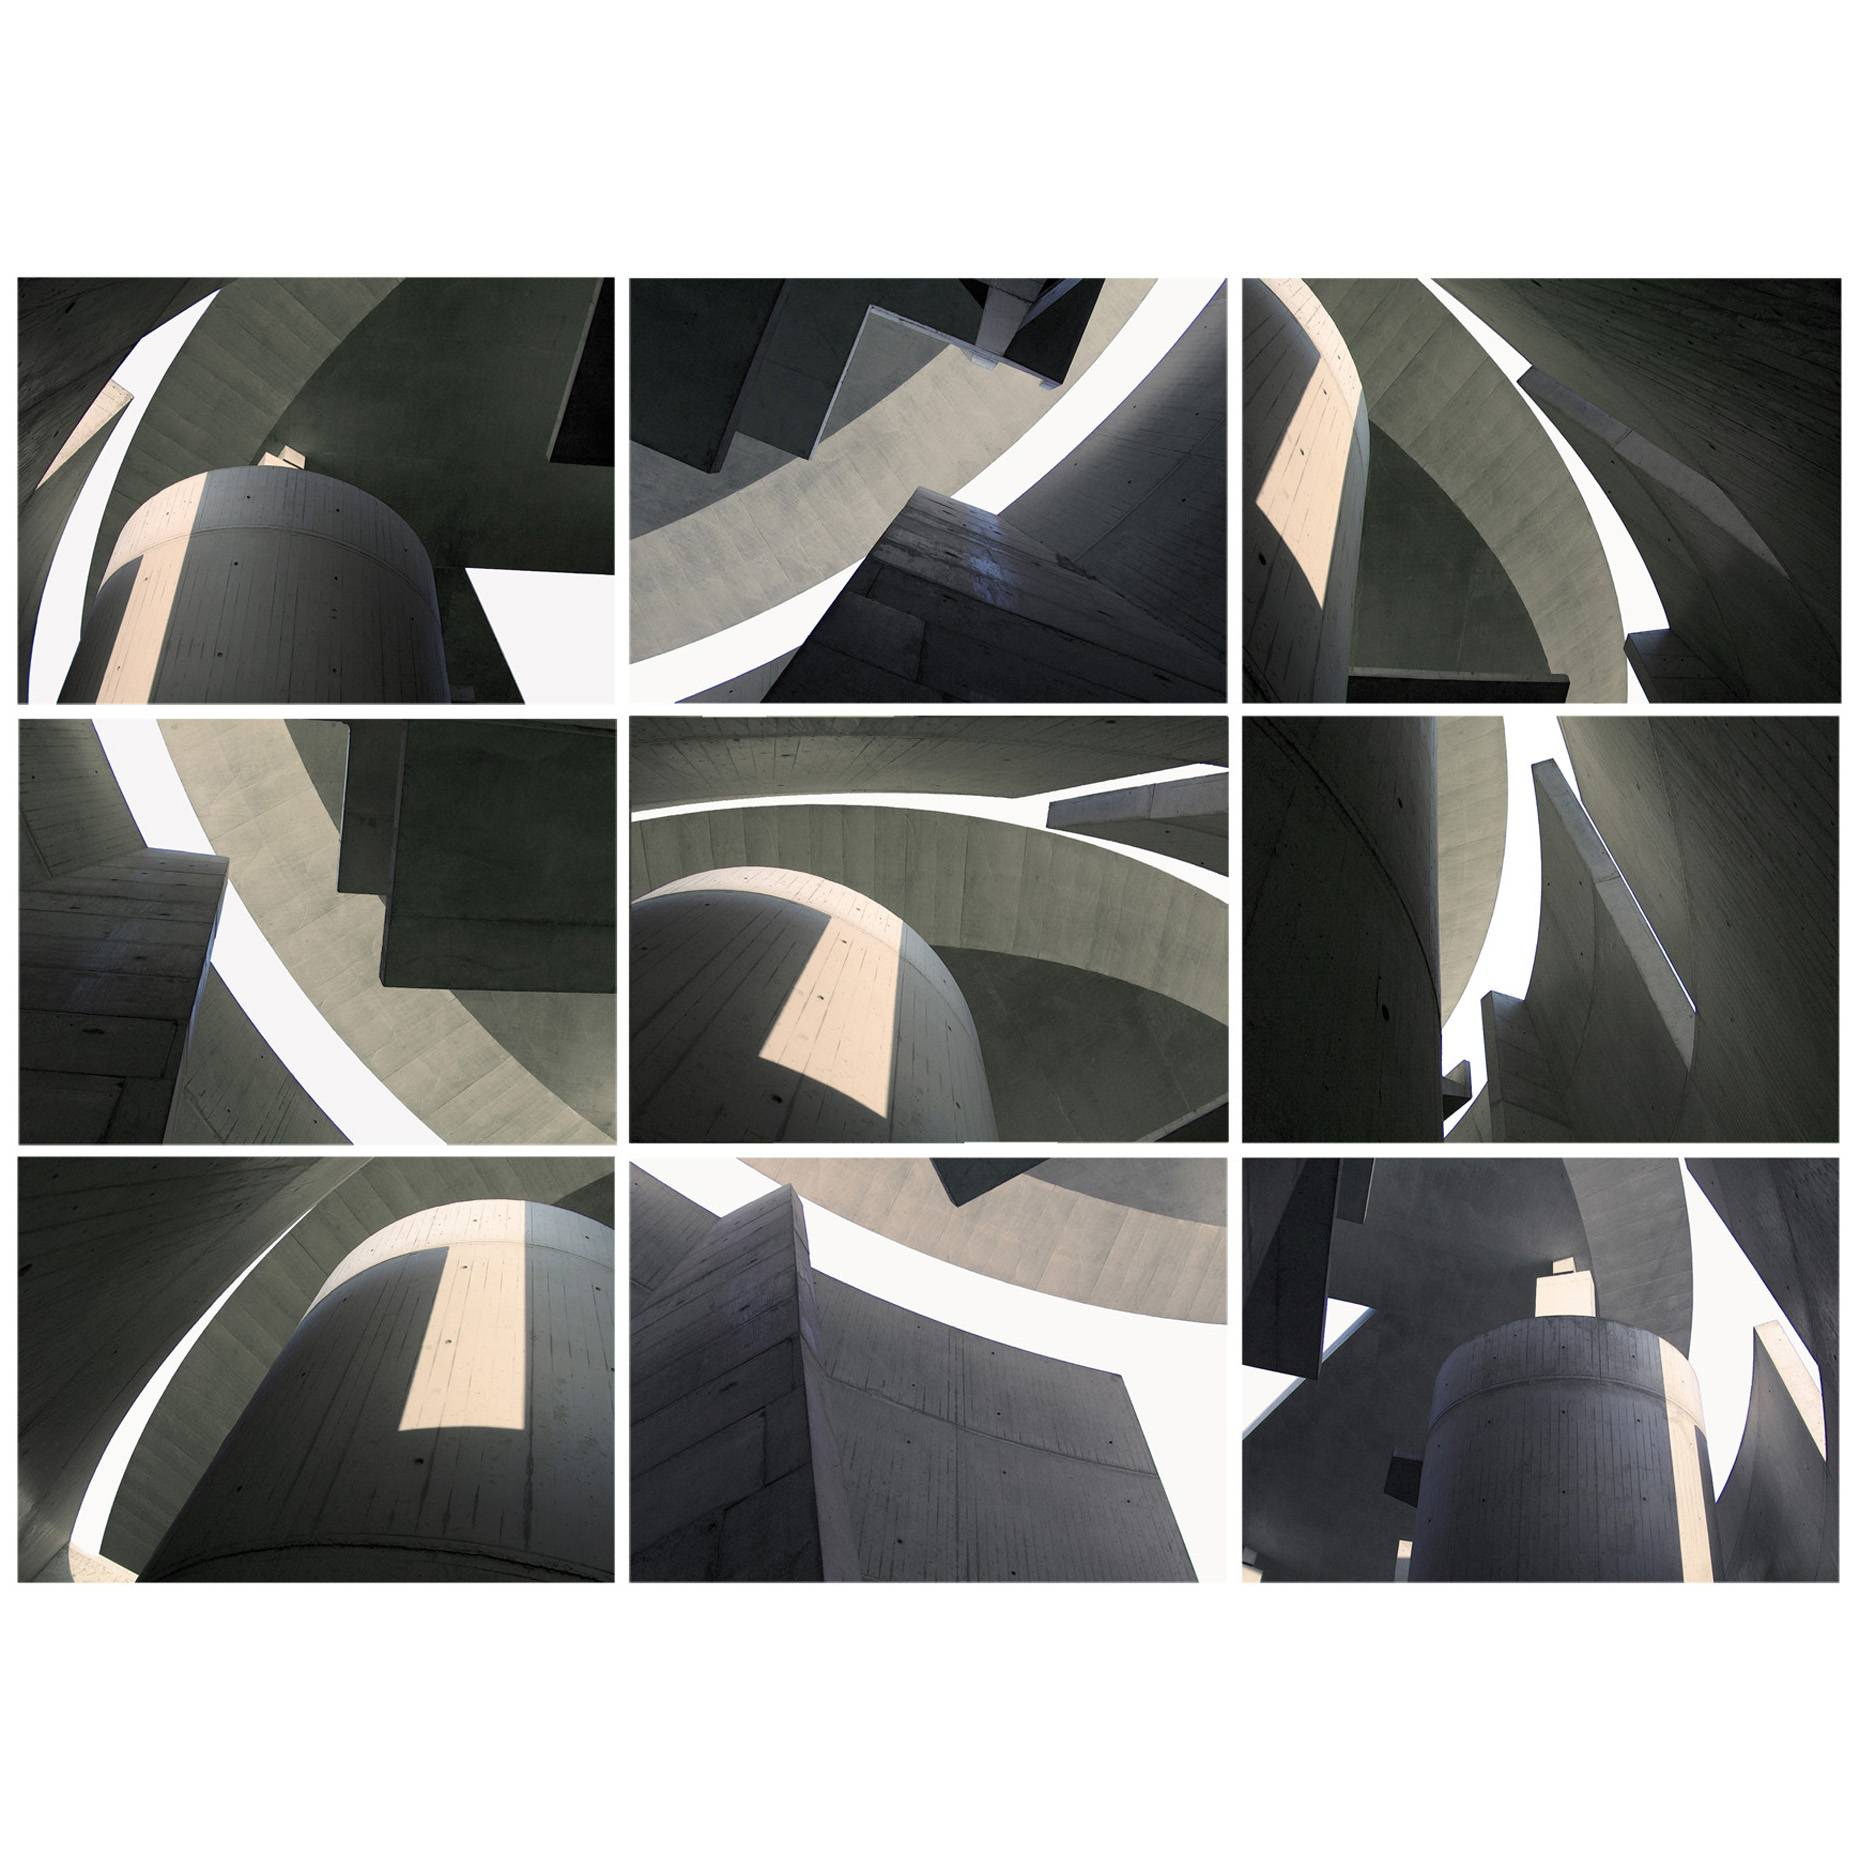 Haus für Musiker 2010 9 tlg. Sequenz Ultrachrome K3 Tinte a/Canson Infinity 210g/qm